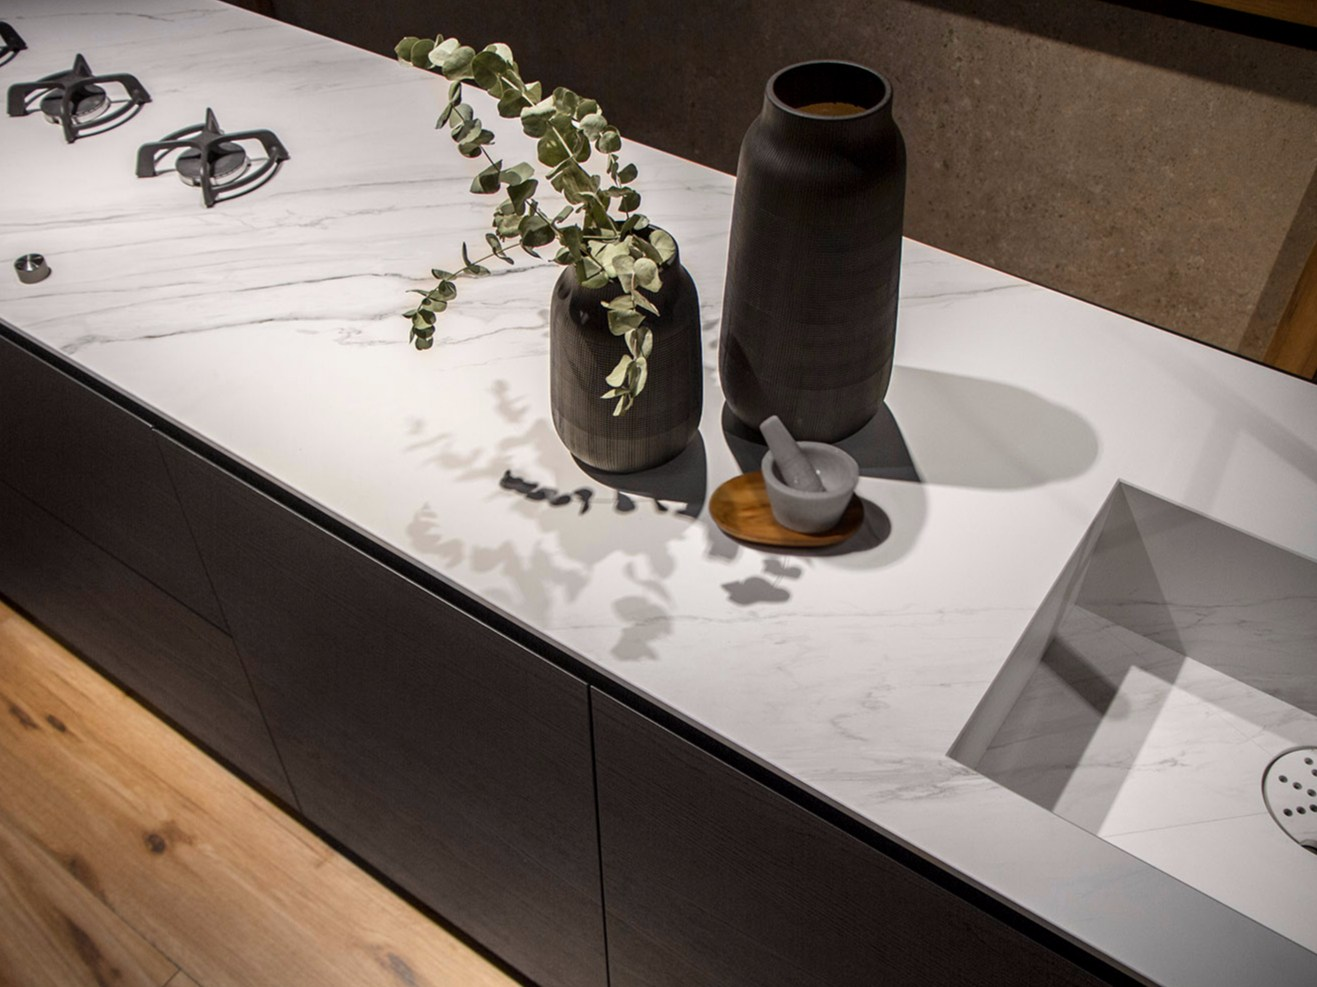 TOUCHÉ-ITOPKER-Porcelain-stoneware-kitchen-workt-INALCO-INDUSTRIAS-ALCORENSES-CONFEDERADAS-213315-re